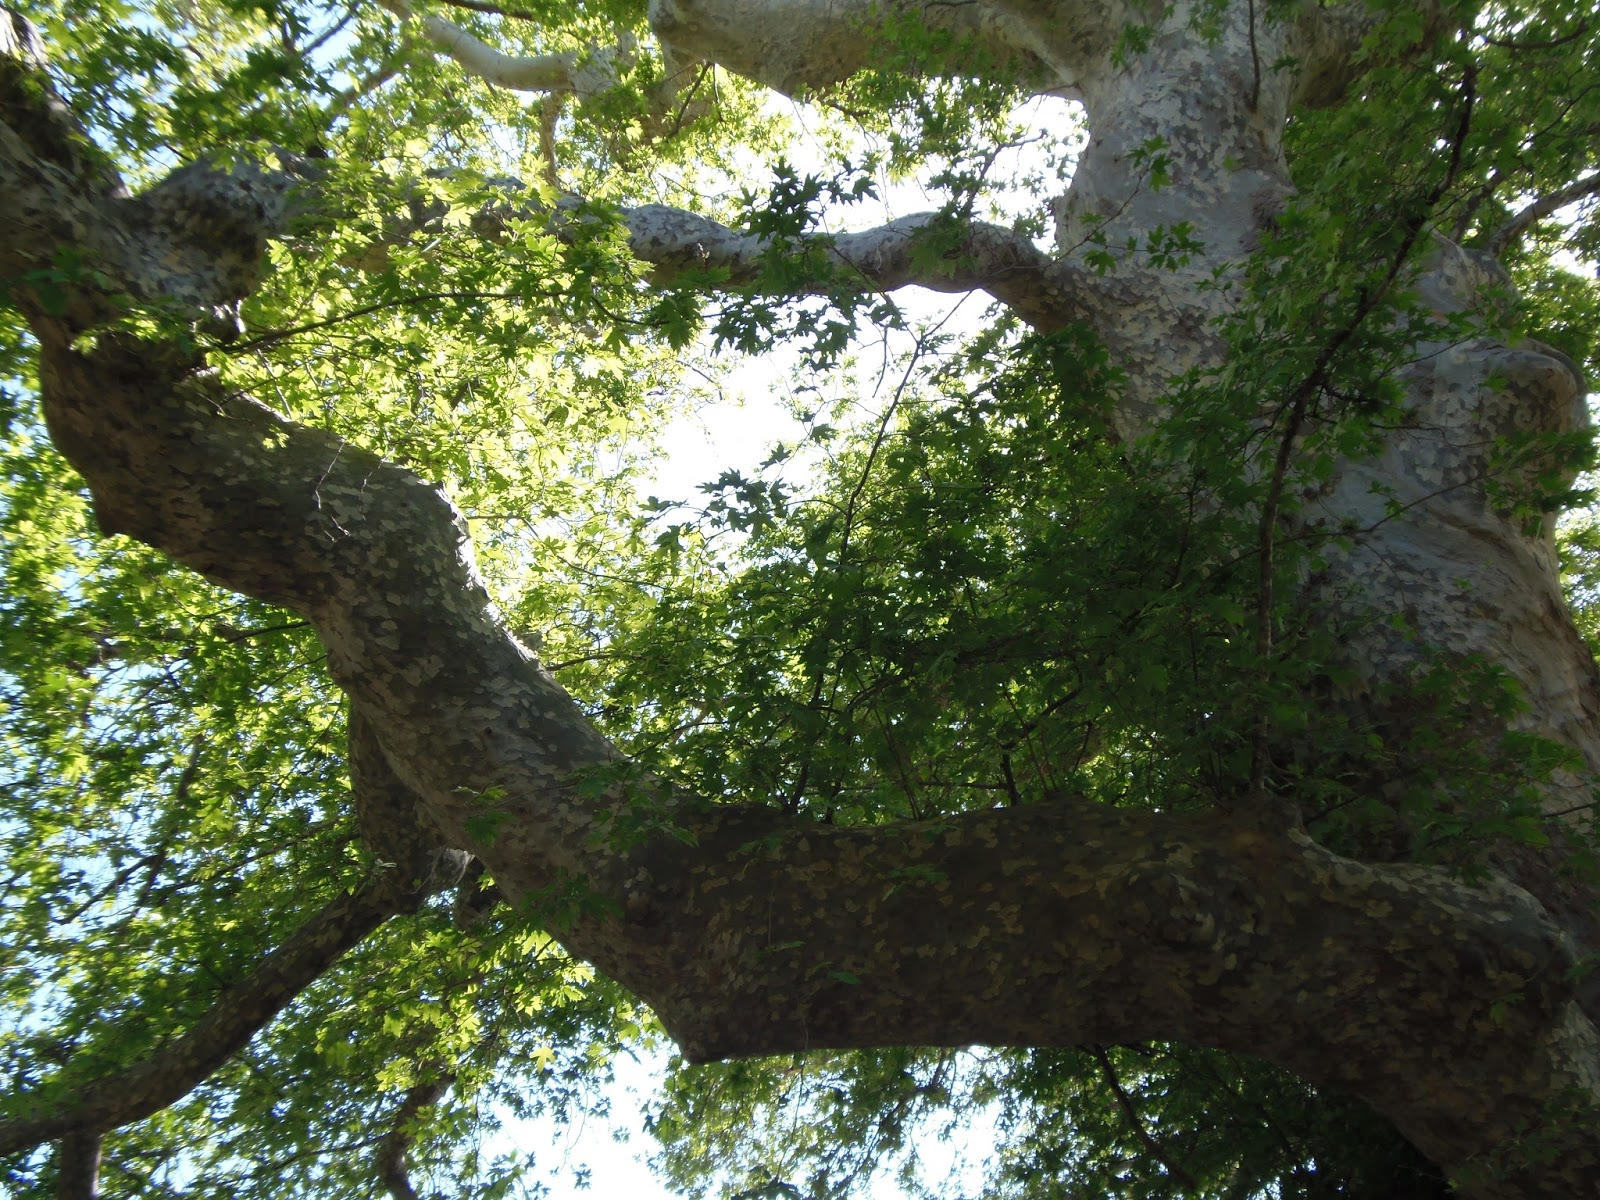 monumental plane tree, olive tree, fig tree, crete, greece, jeep safari, travel, traveling